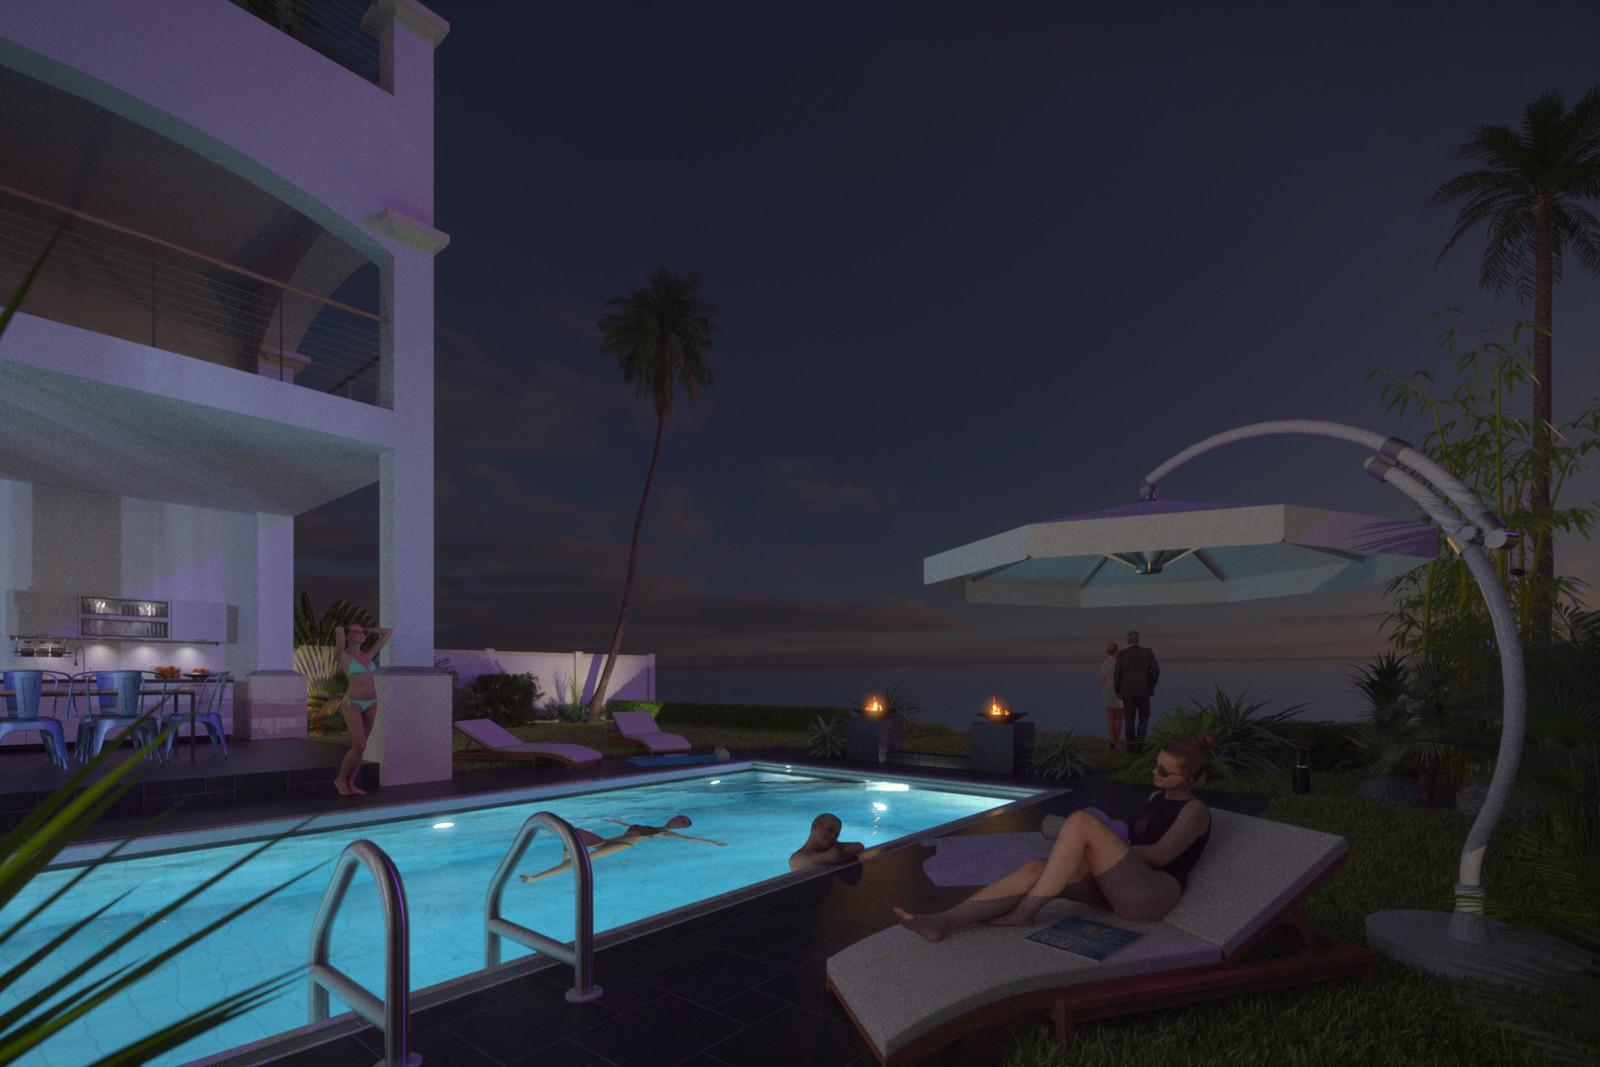 SketchUp + Thea Render  Seagrove Beach House: Poolside 02 3-2 Night A Glare Kevin 1620 × 1080 Presto MC Bucket